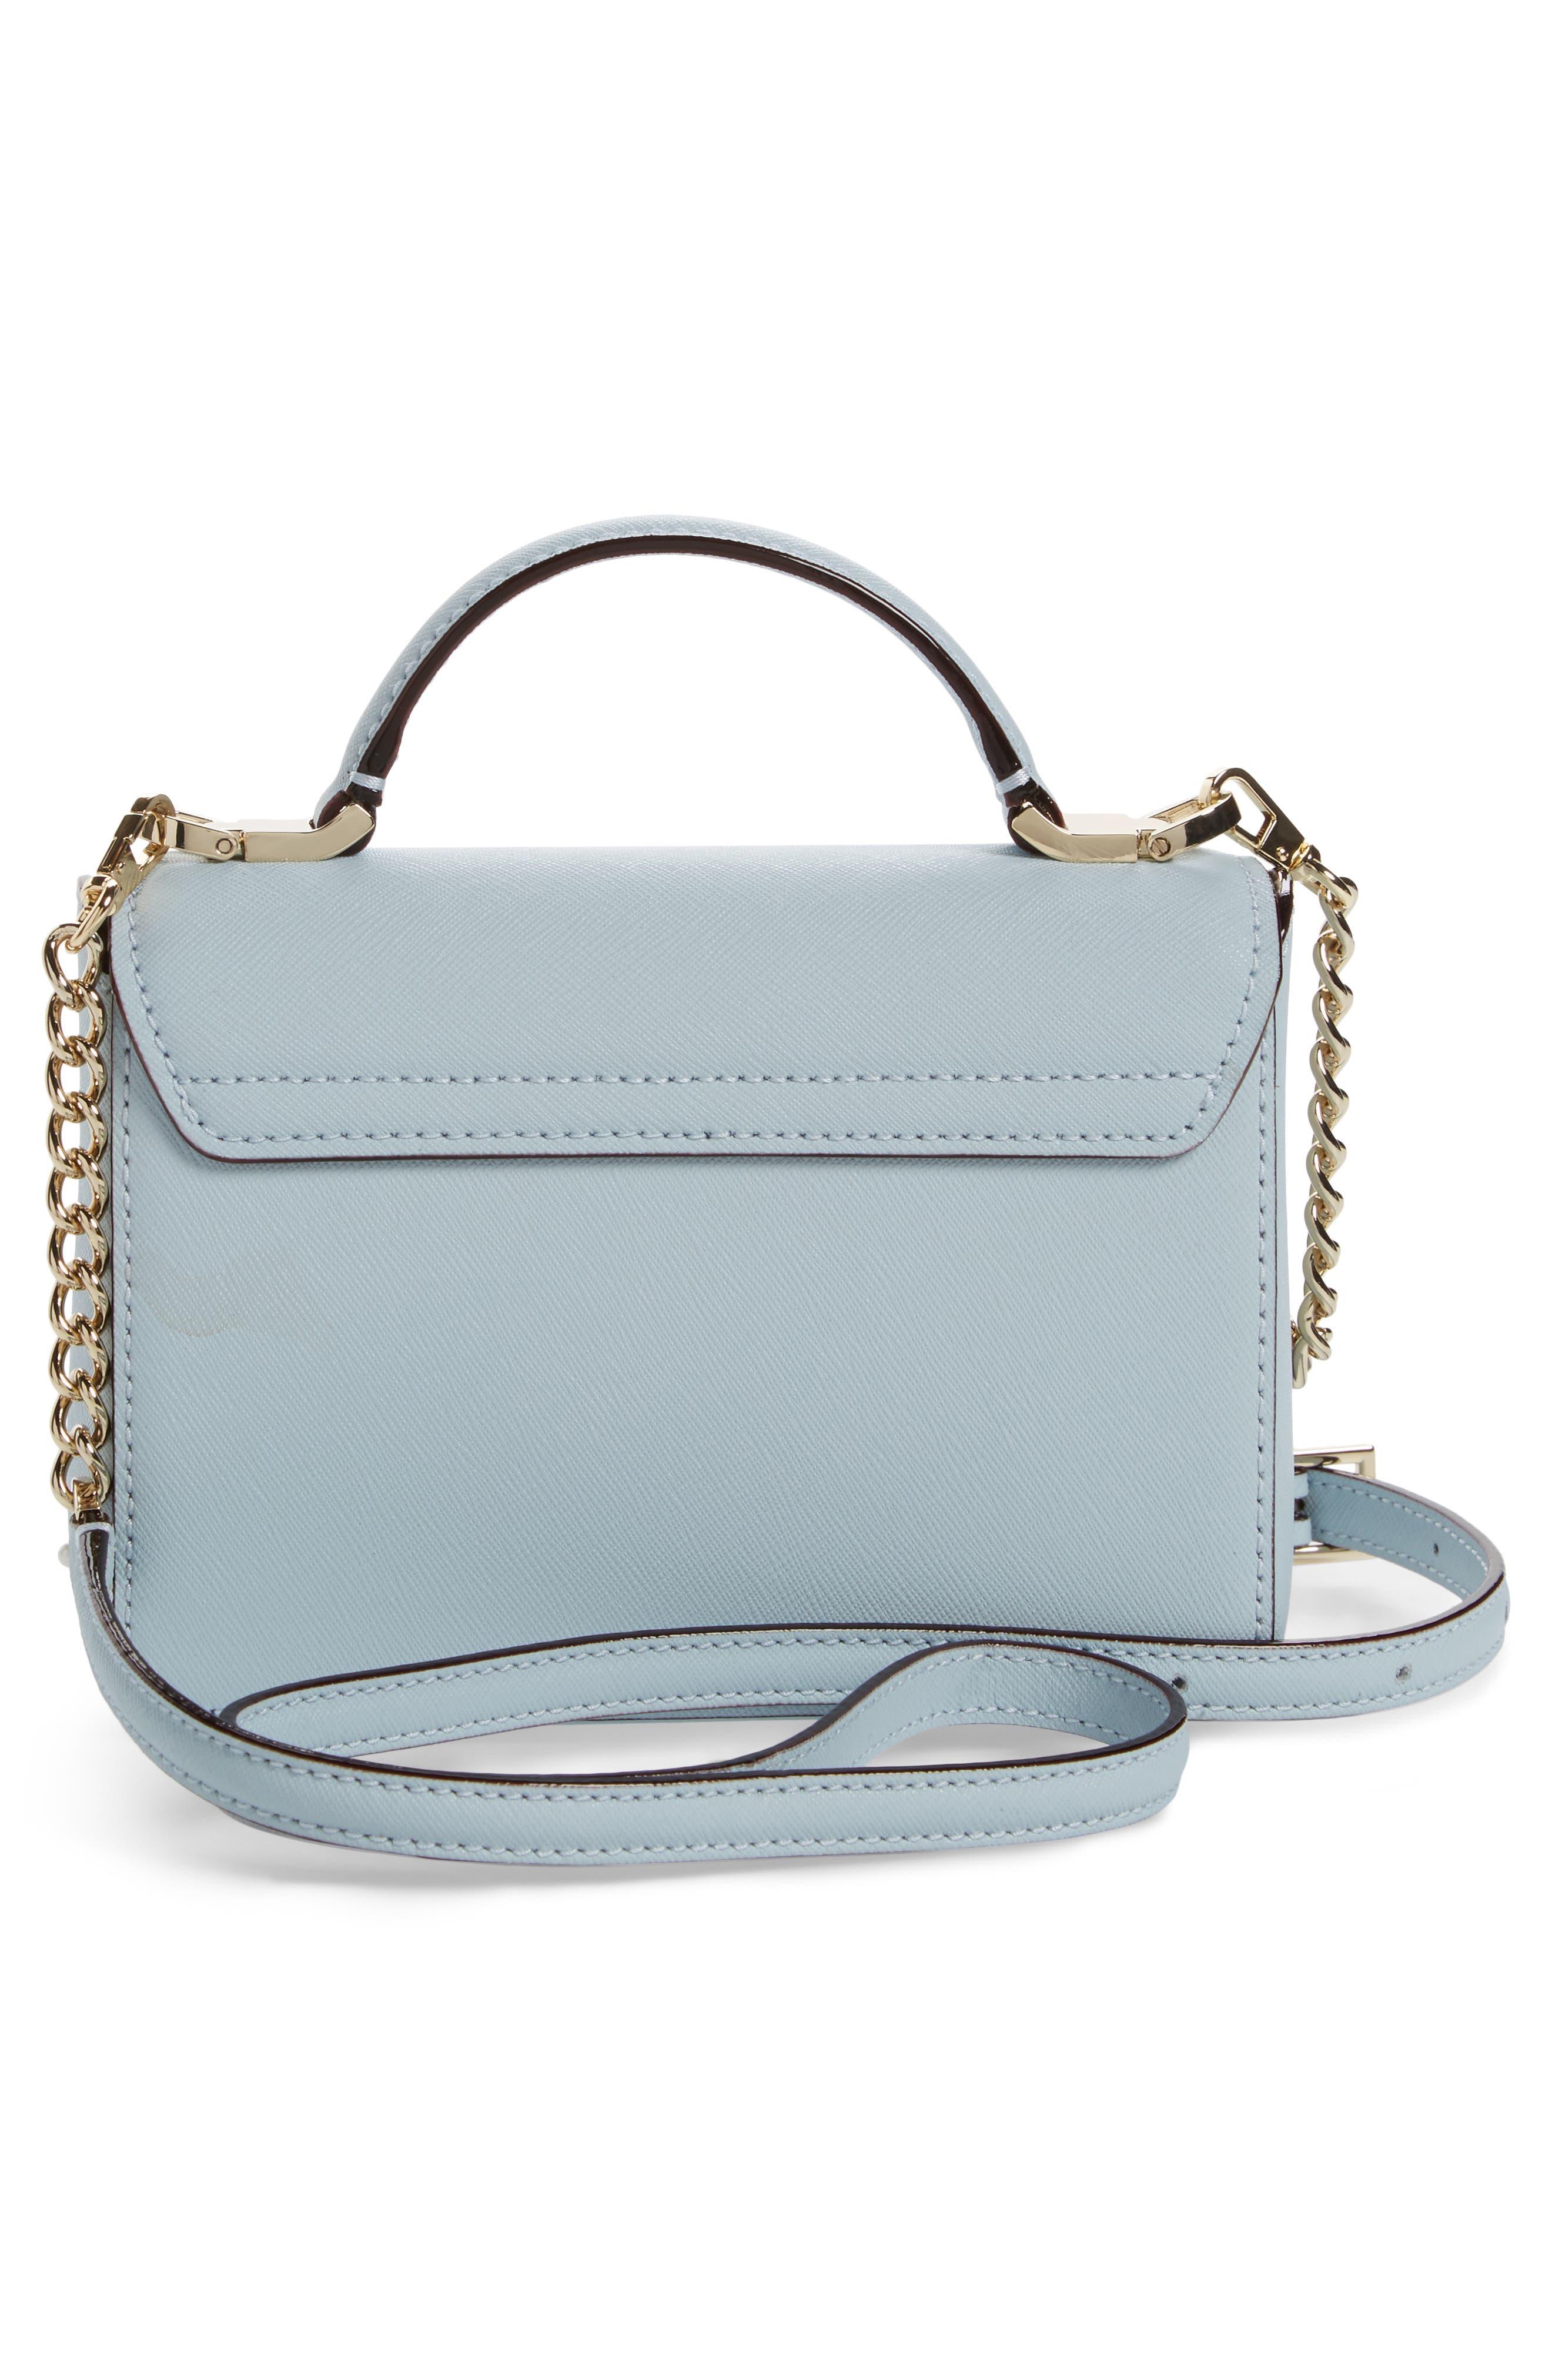 cameron street - hope saffiano leather crossbody bag,                             Alternate thumbnail 8, color,